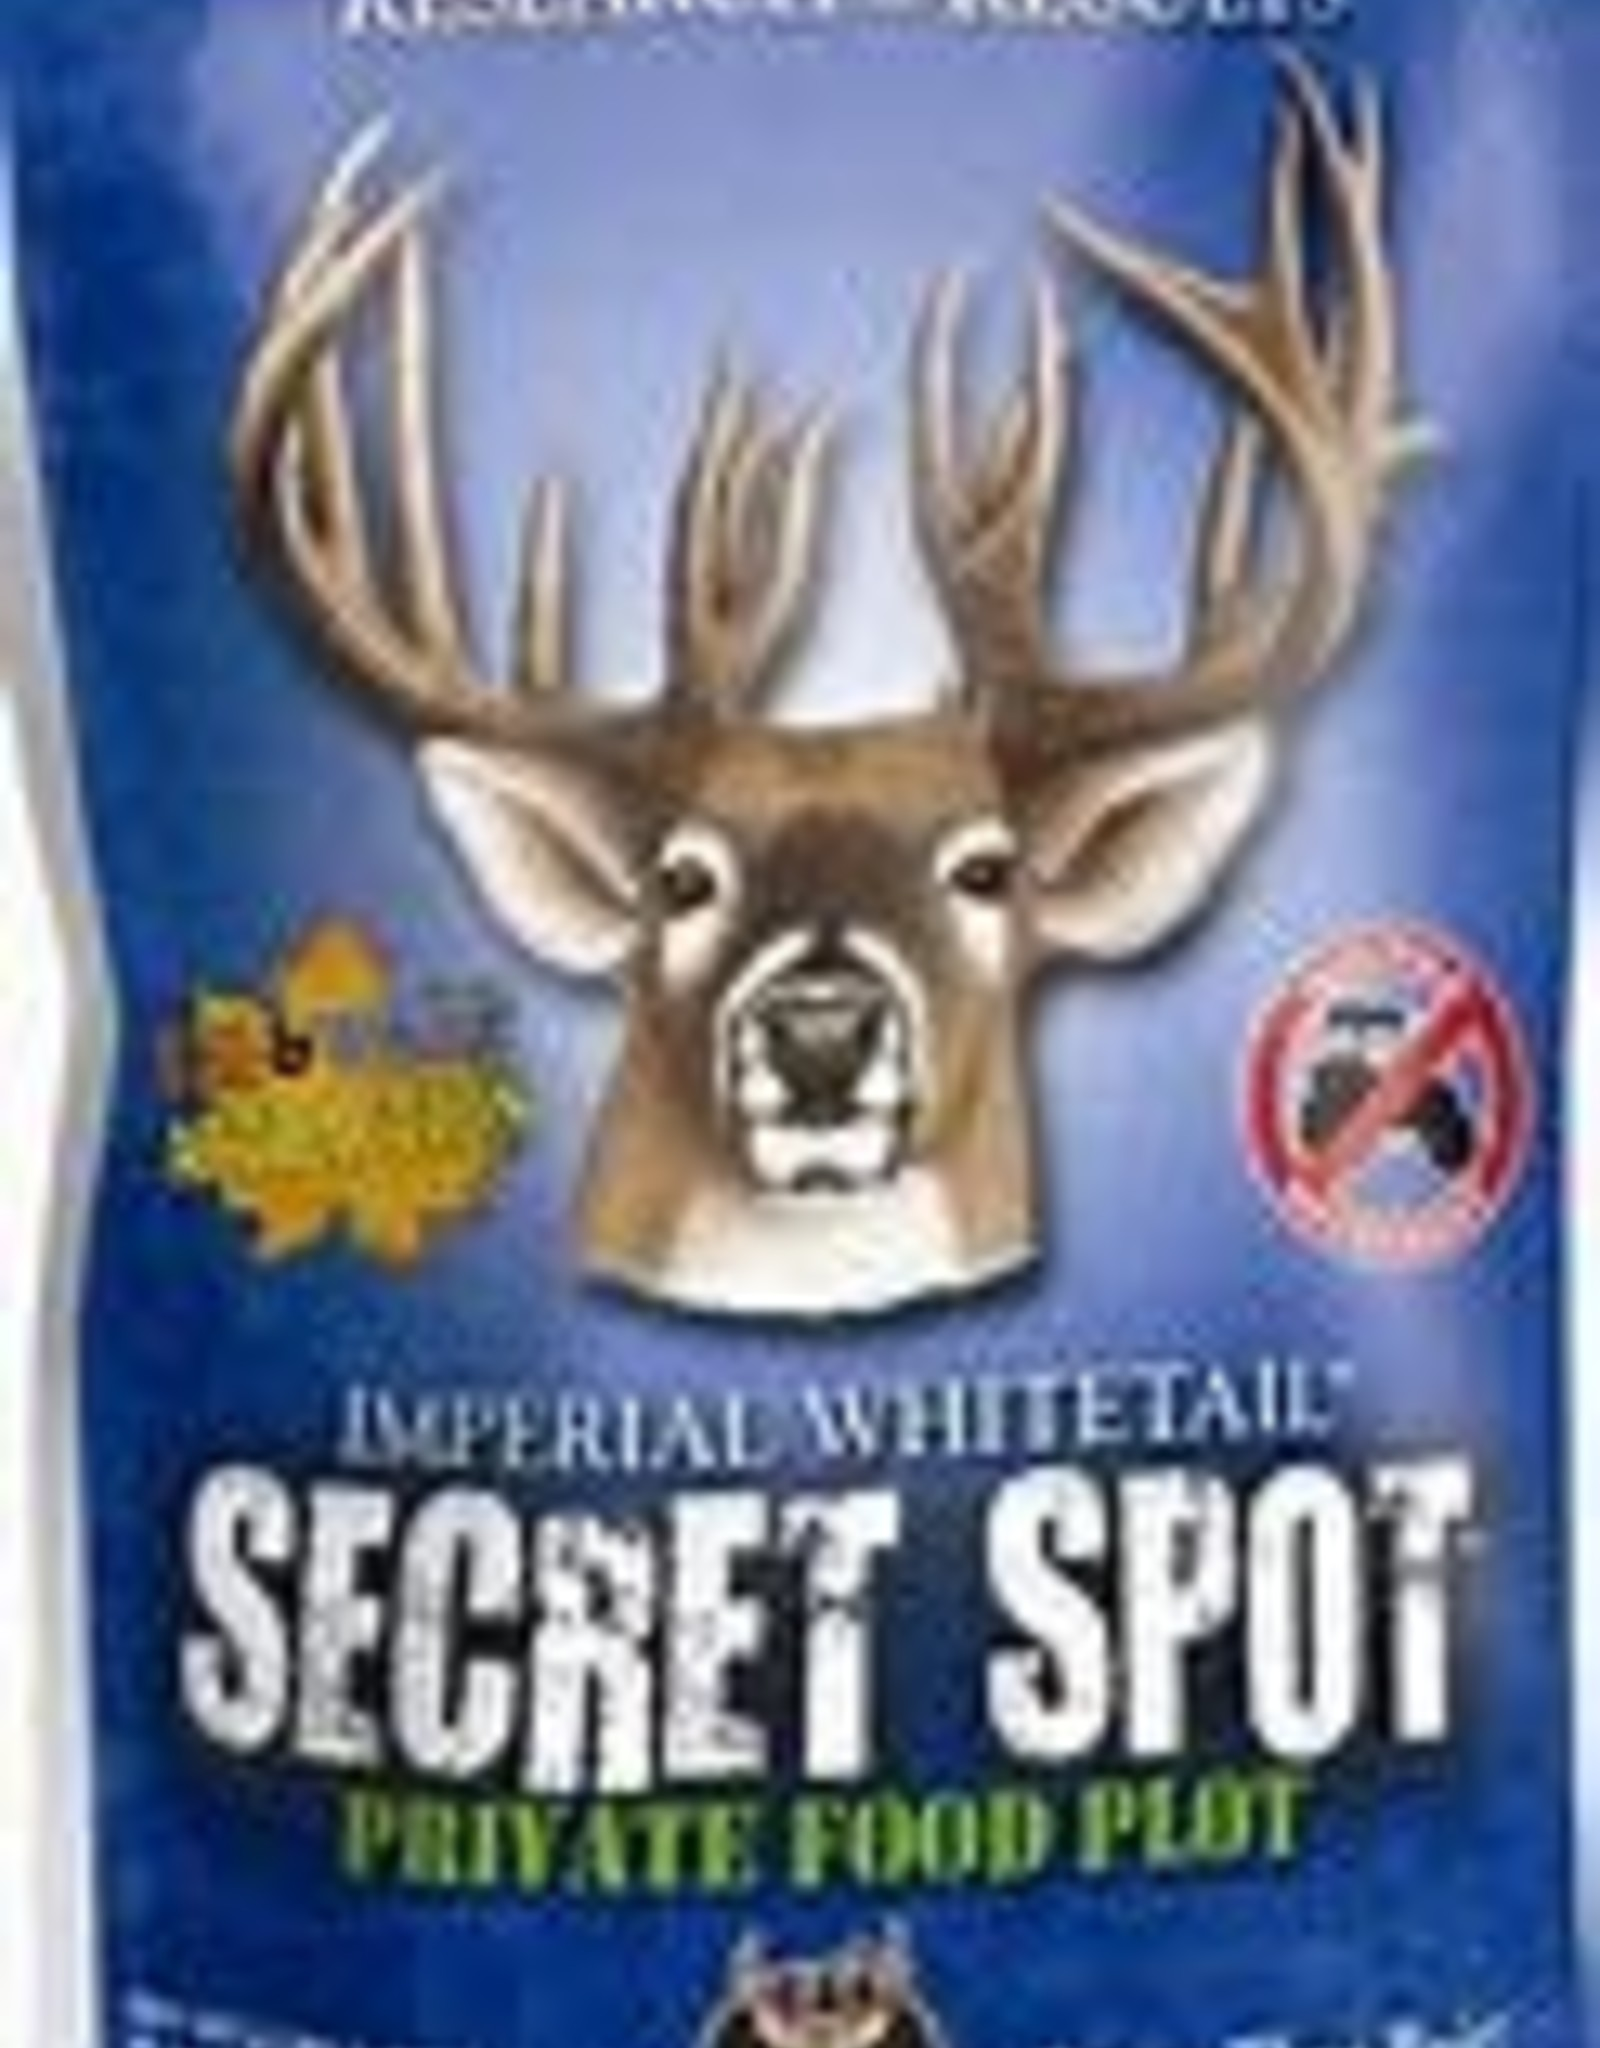 Whitetail Institute Secret Spot 4 LB Bag